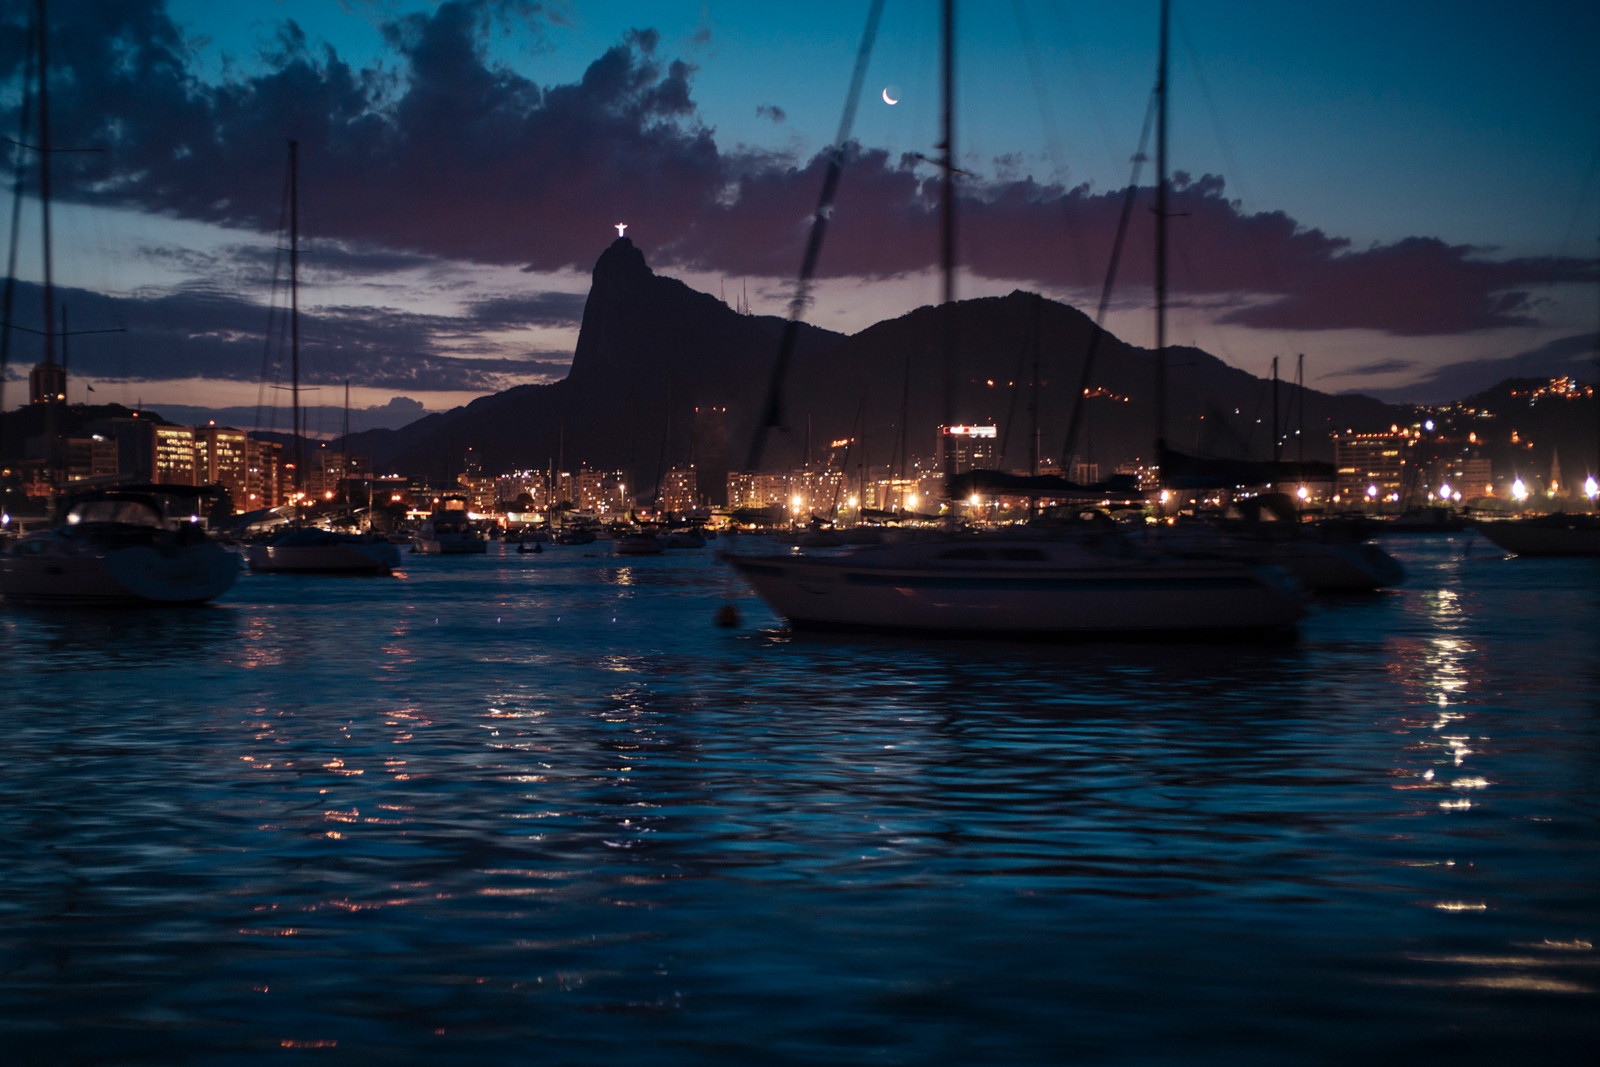 Rio_p5_6.jpg